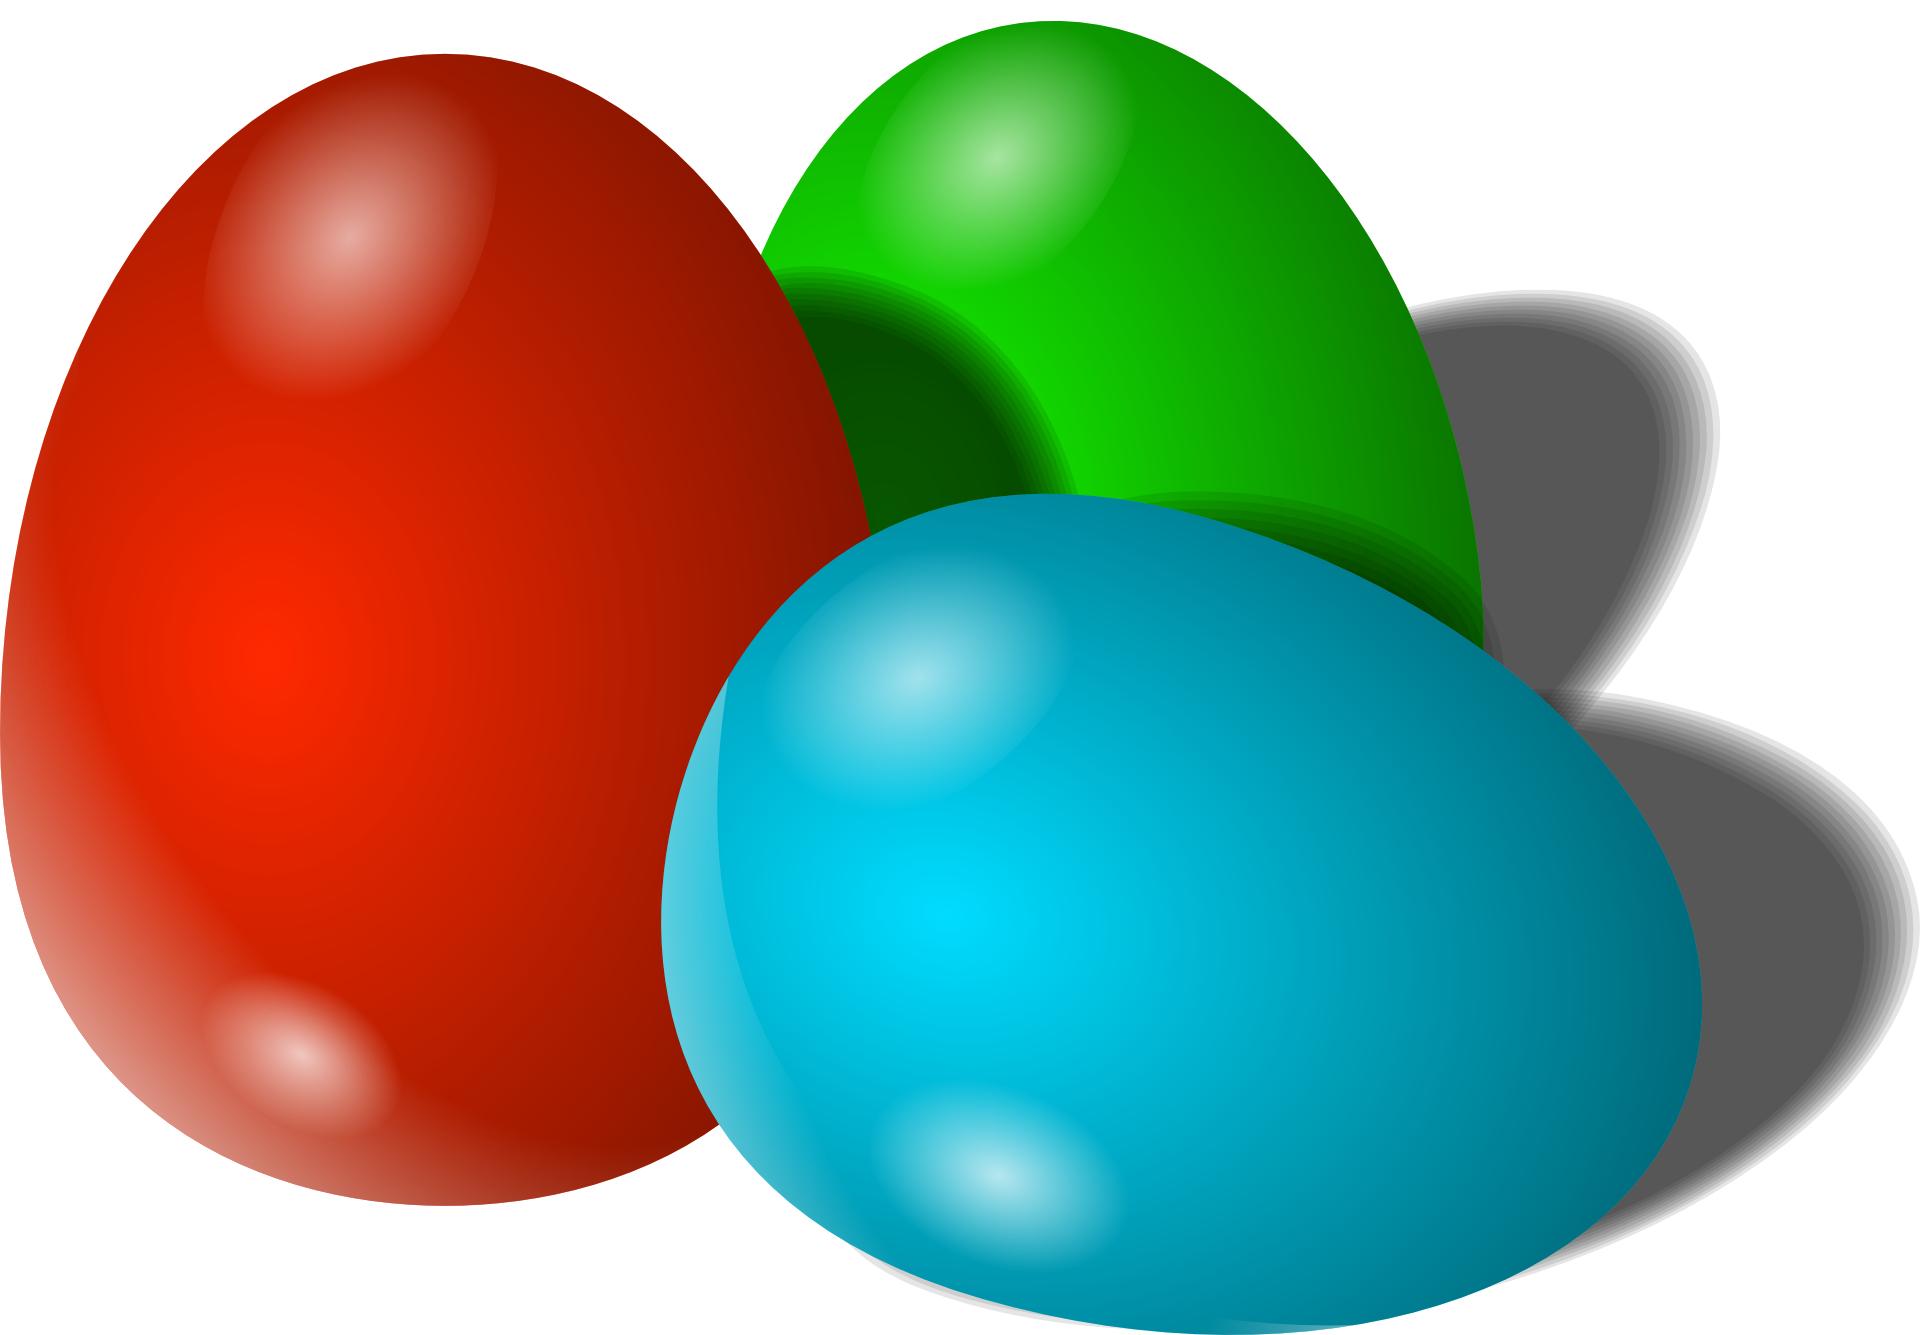 Red,blue,green eggs-cartoon egg vector